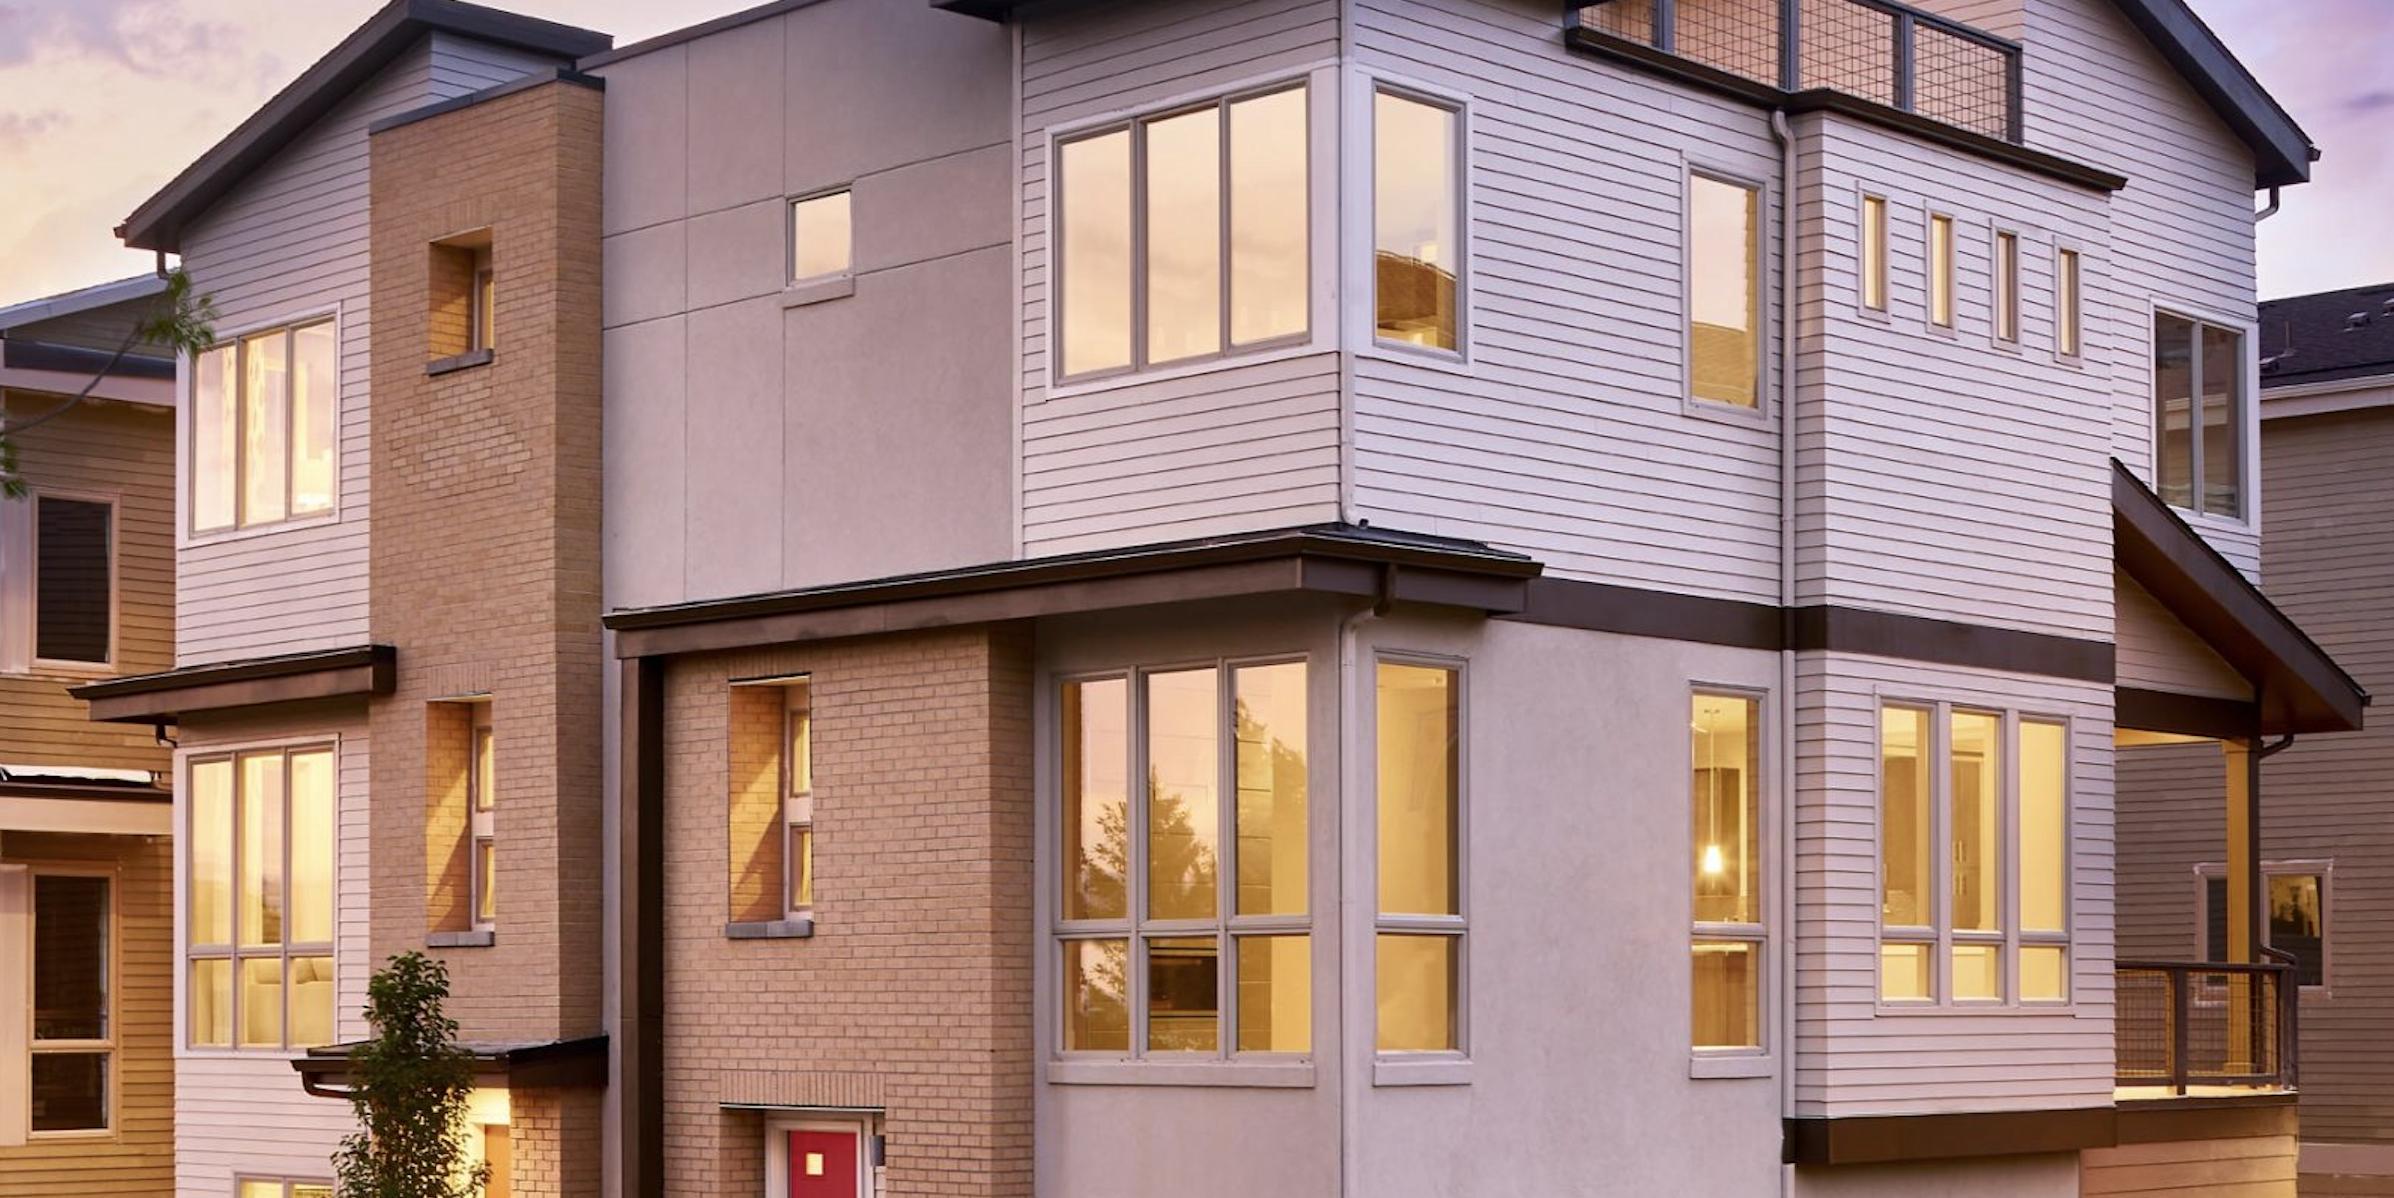 5390' Community by Koelbel in the Berkeley Tennyson Neighborhood Denver New Construction Homes For Sale Elevation2